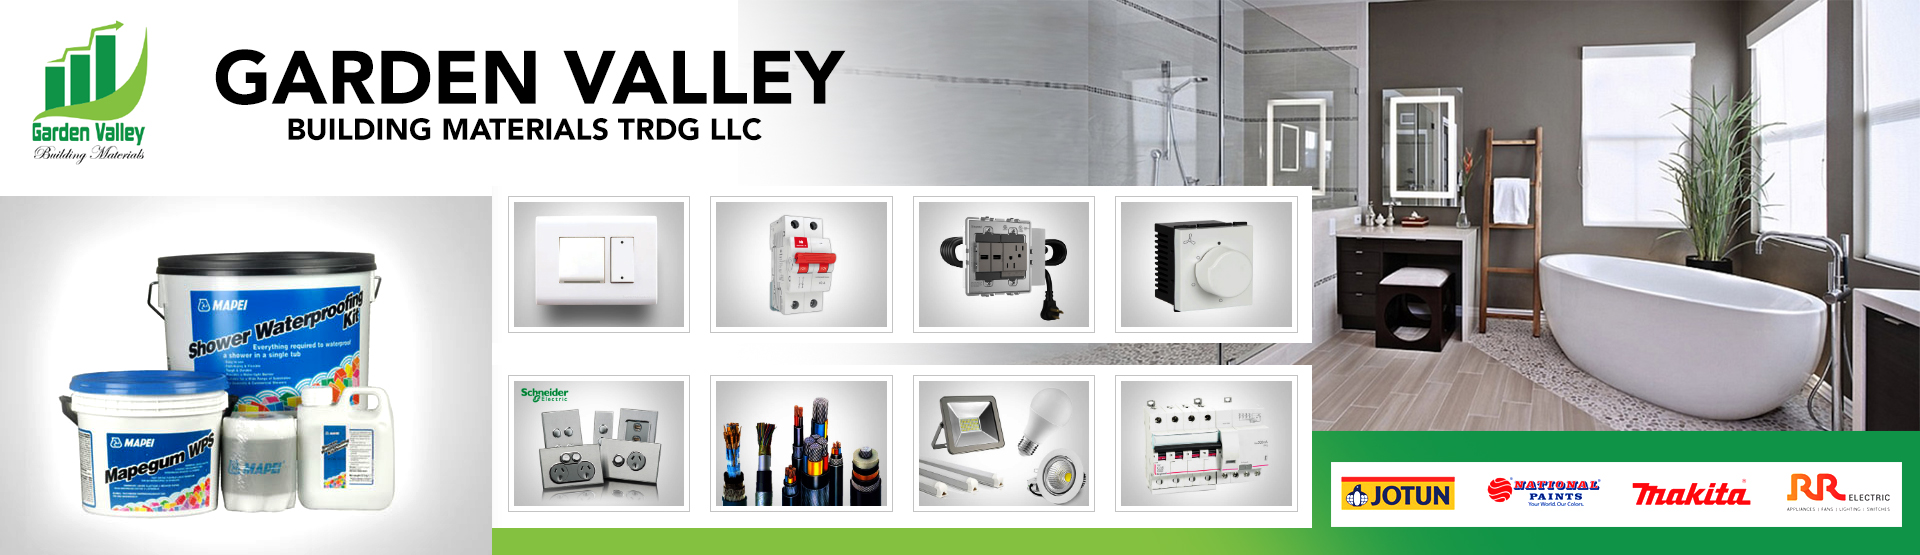 GARDEN VALLEY BUILDING MATERIALS TRDG LLC